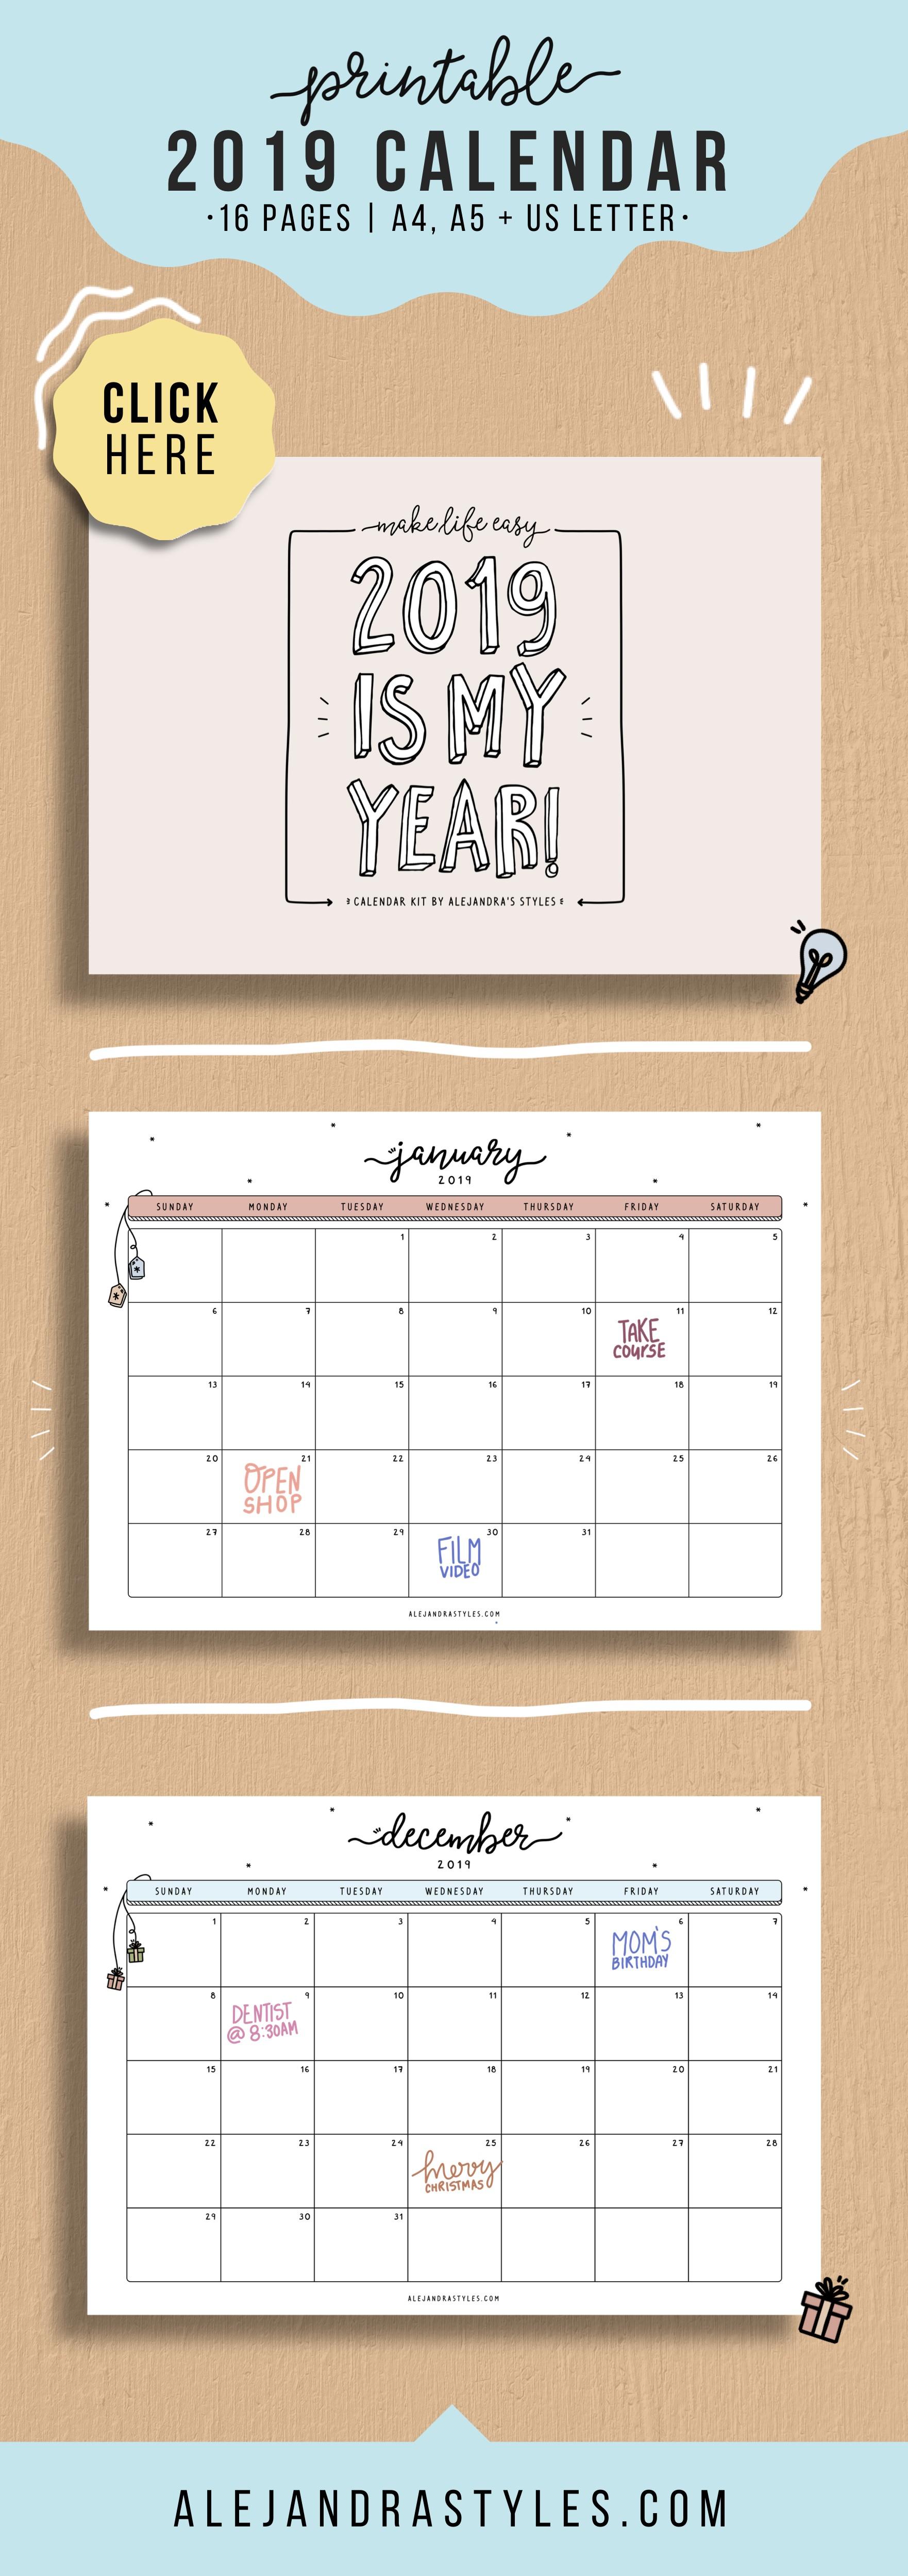 2019 Calendar Printable Planner for Desk or Wall